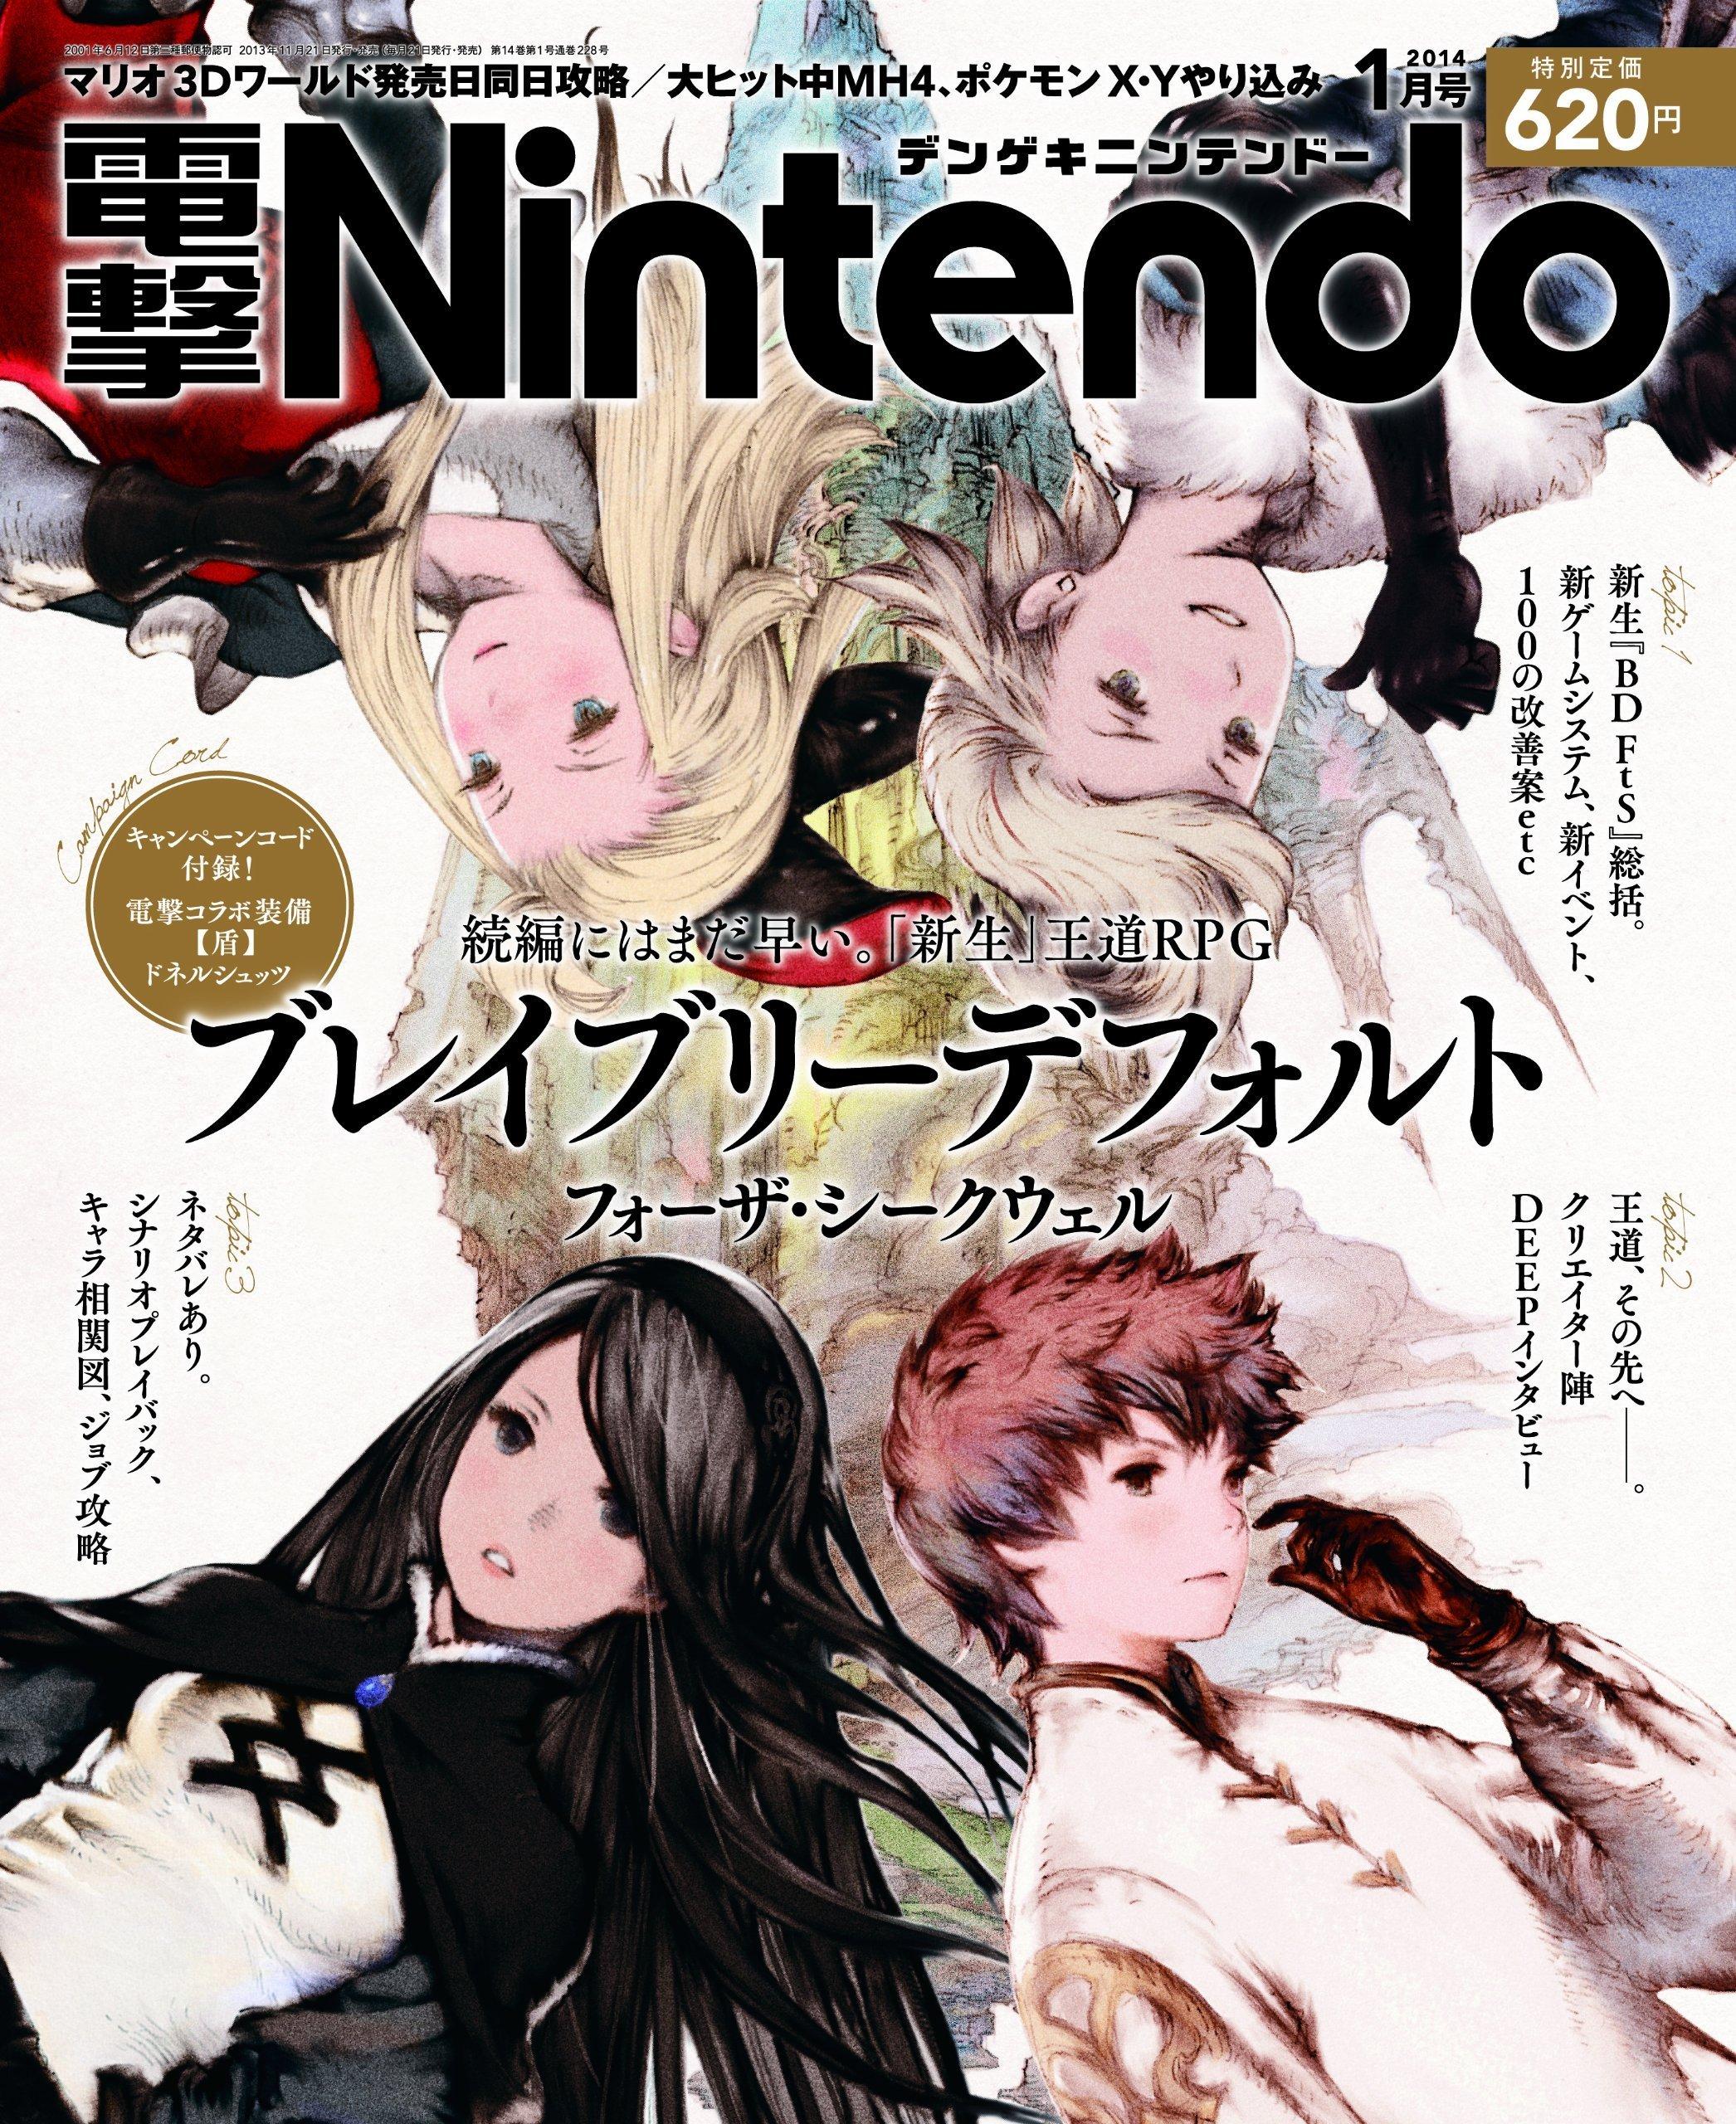 Dengeki Nintendo Issue 008 (January 2014)